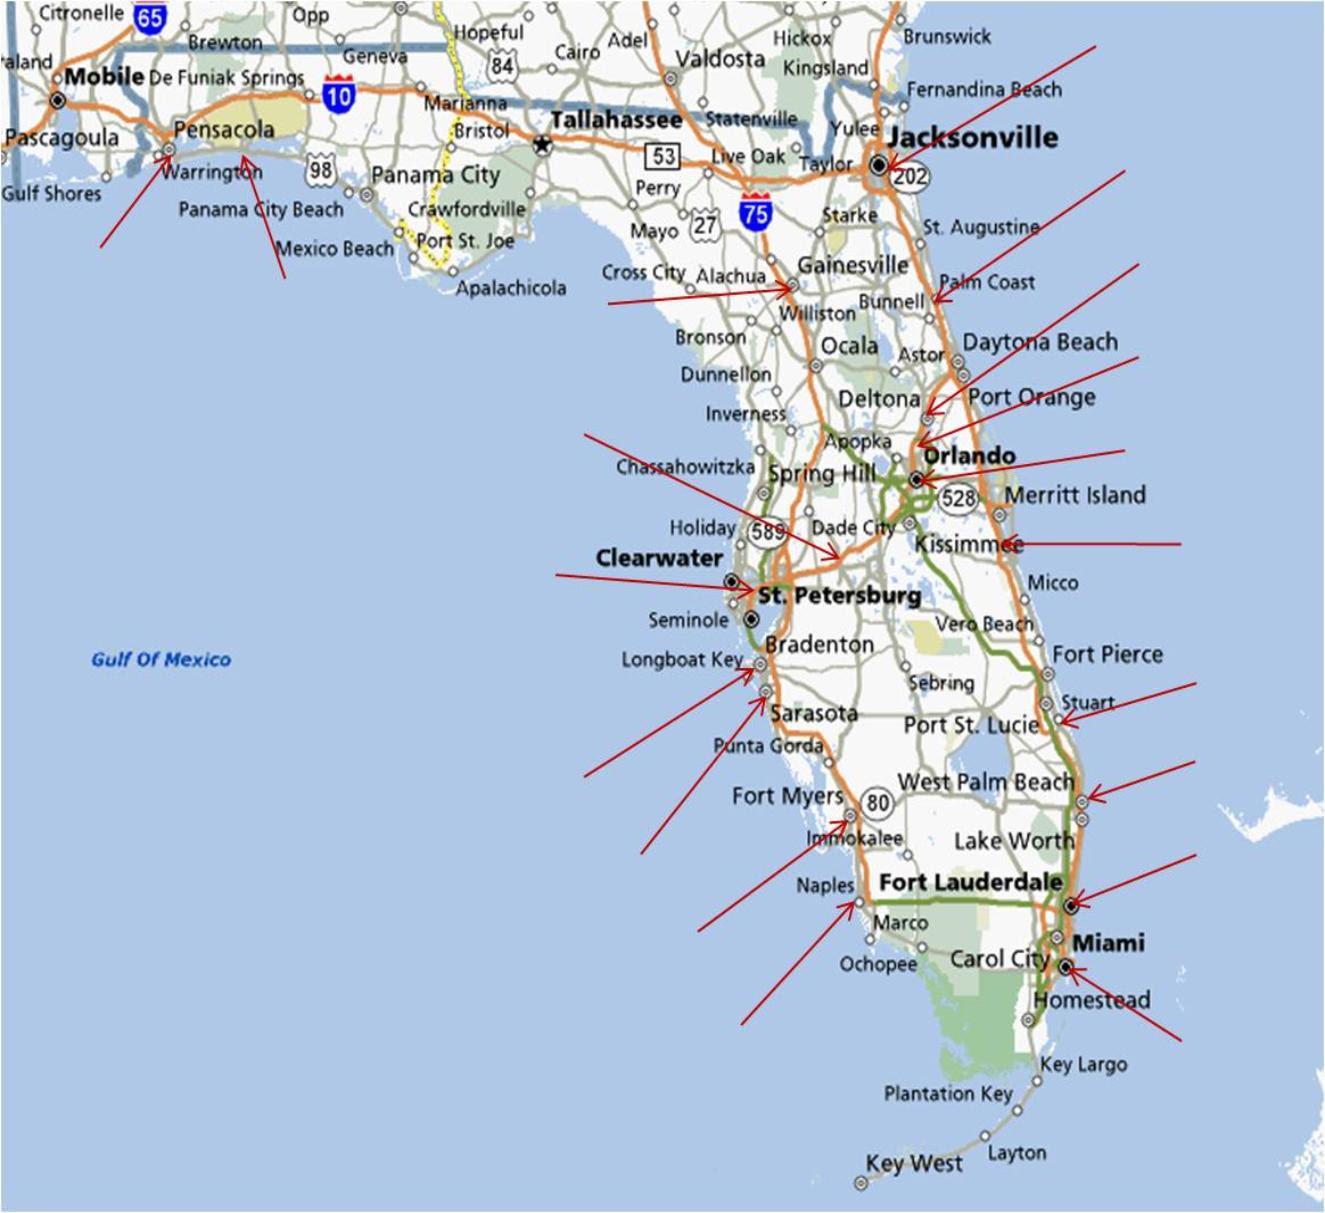 25 Elegant Map Of Florida East Coast Towns